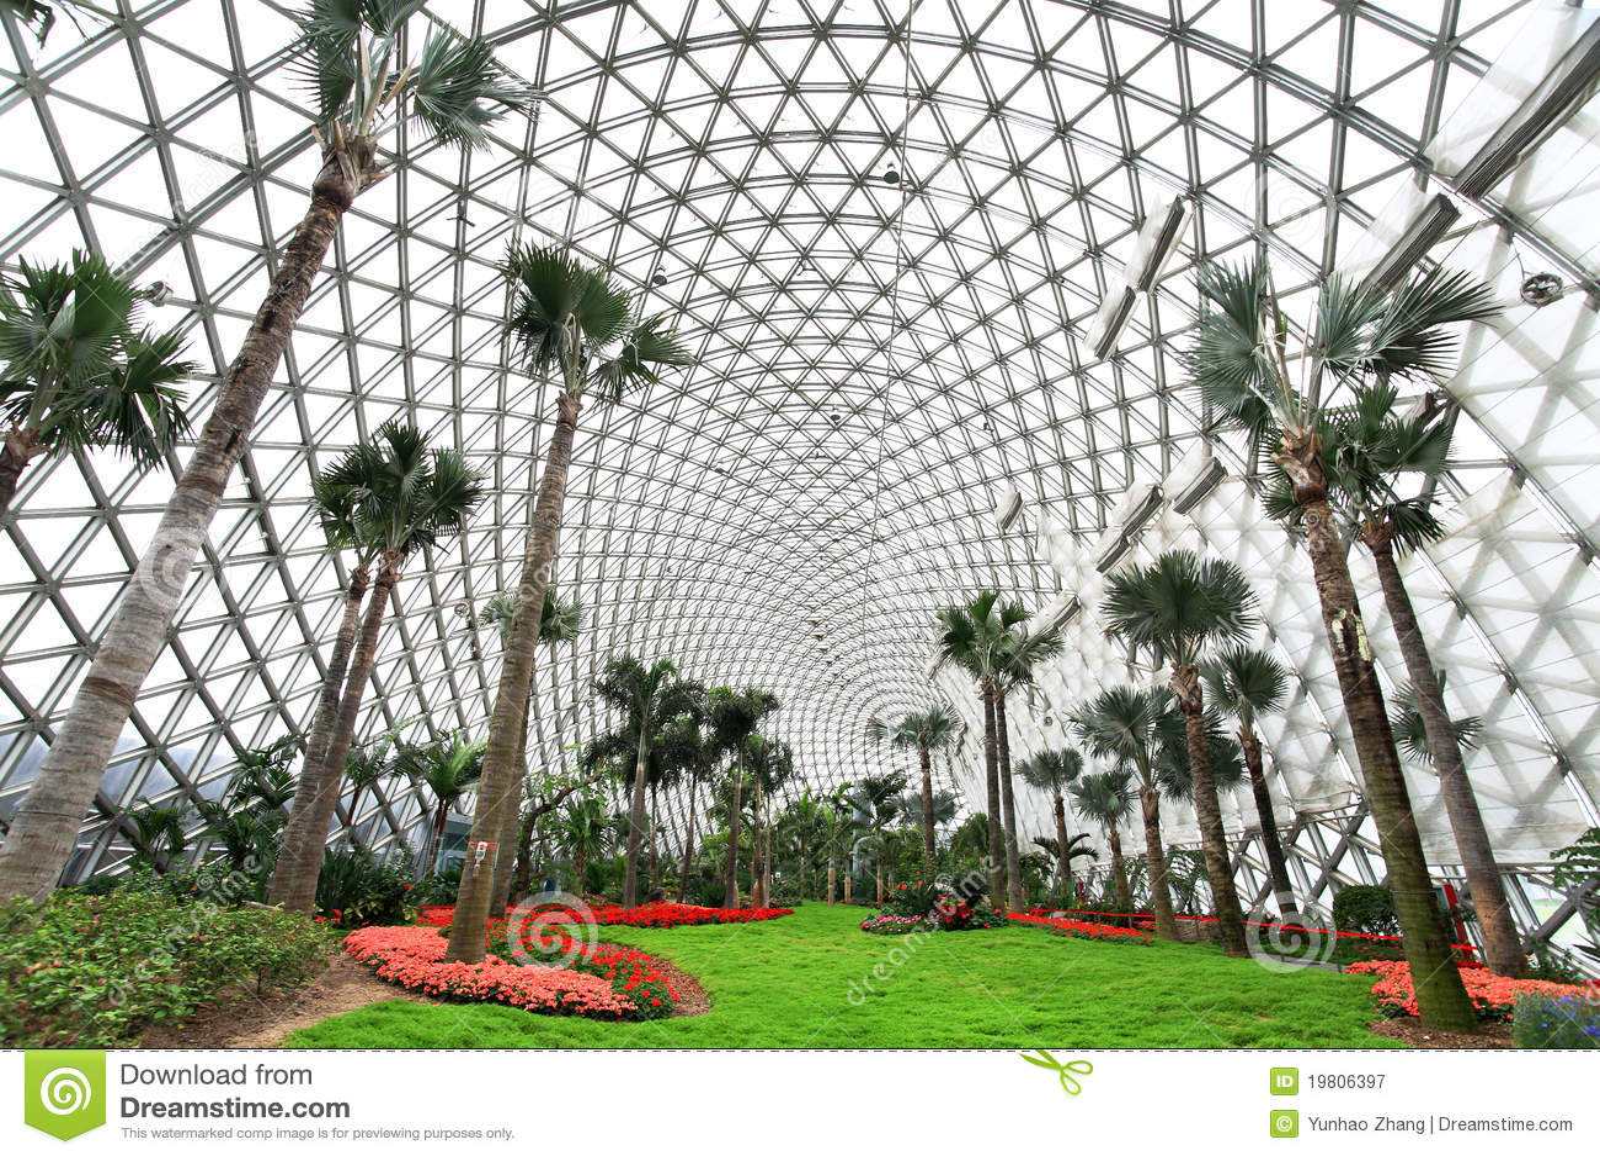 chen shan shanghai botanical garden editorial photography